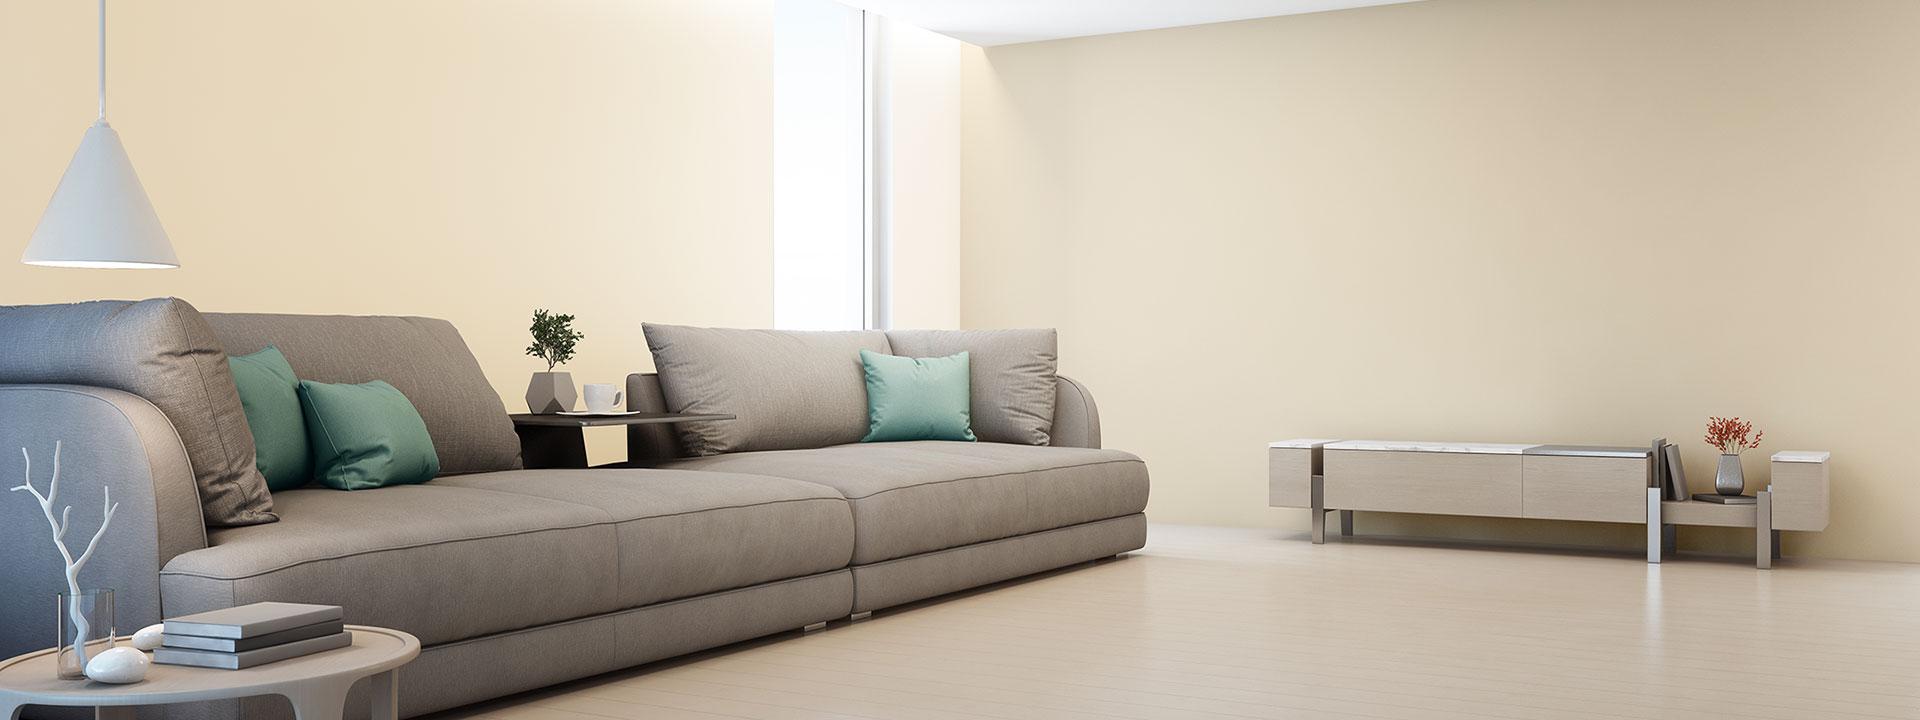 Casa com Starlutex Plus